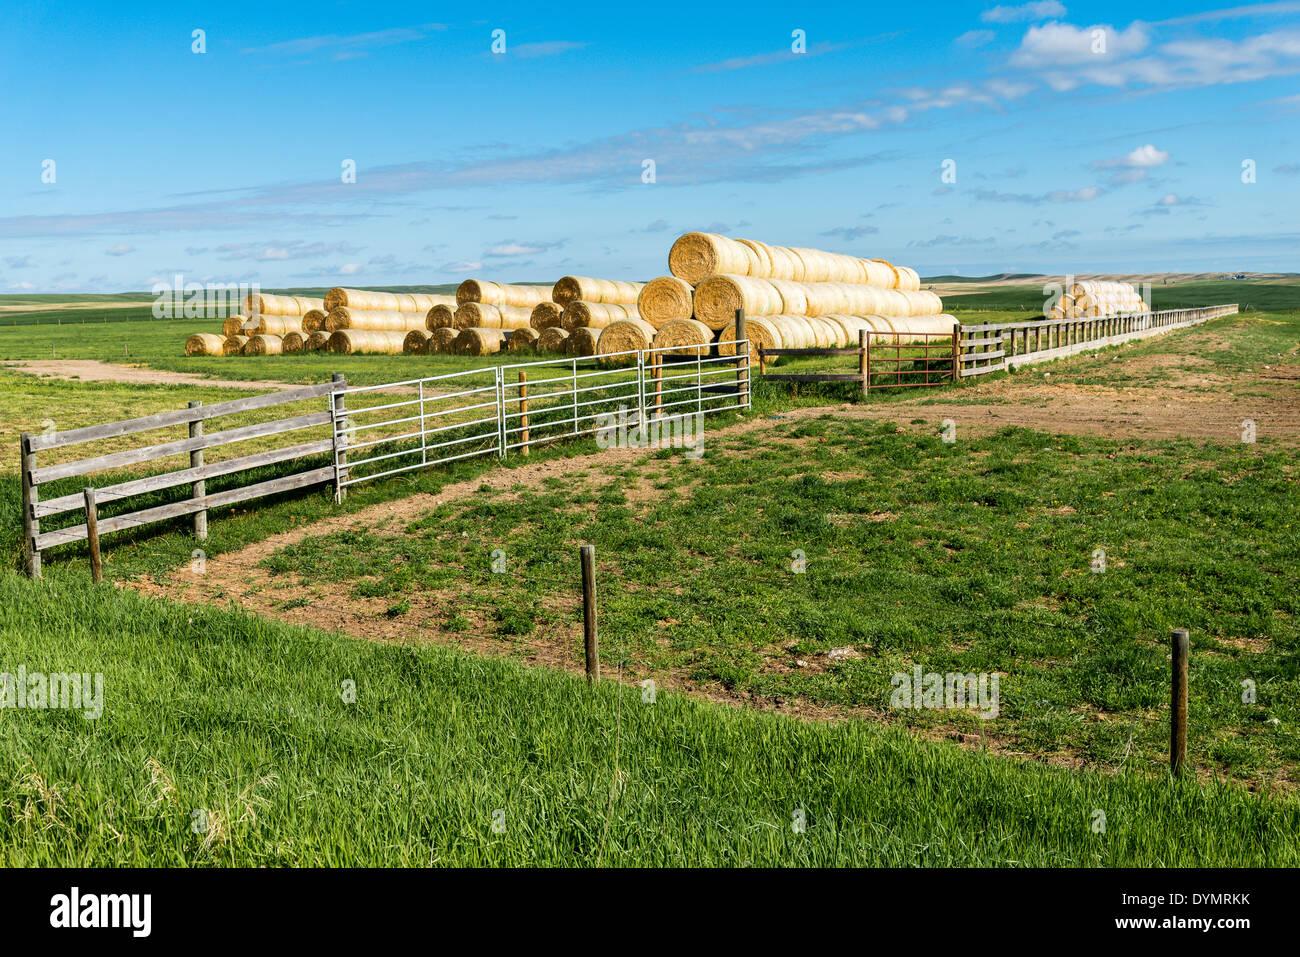 Hay bale piles. Alberta, Canada - Stock Image